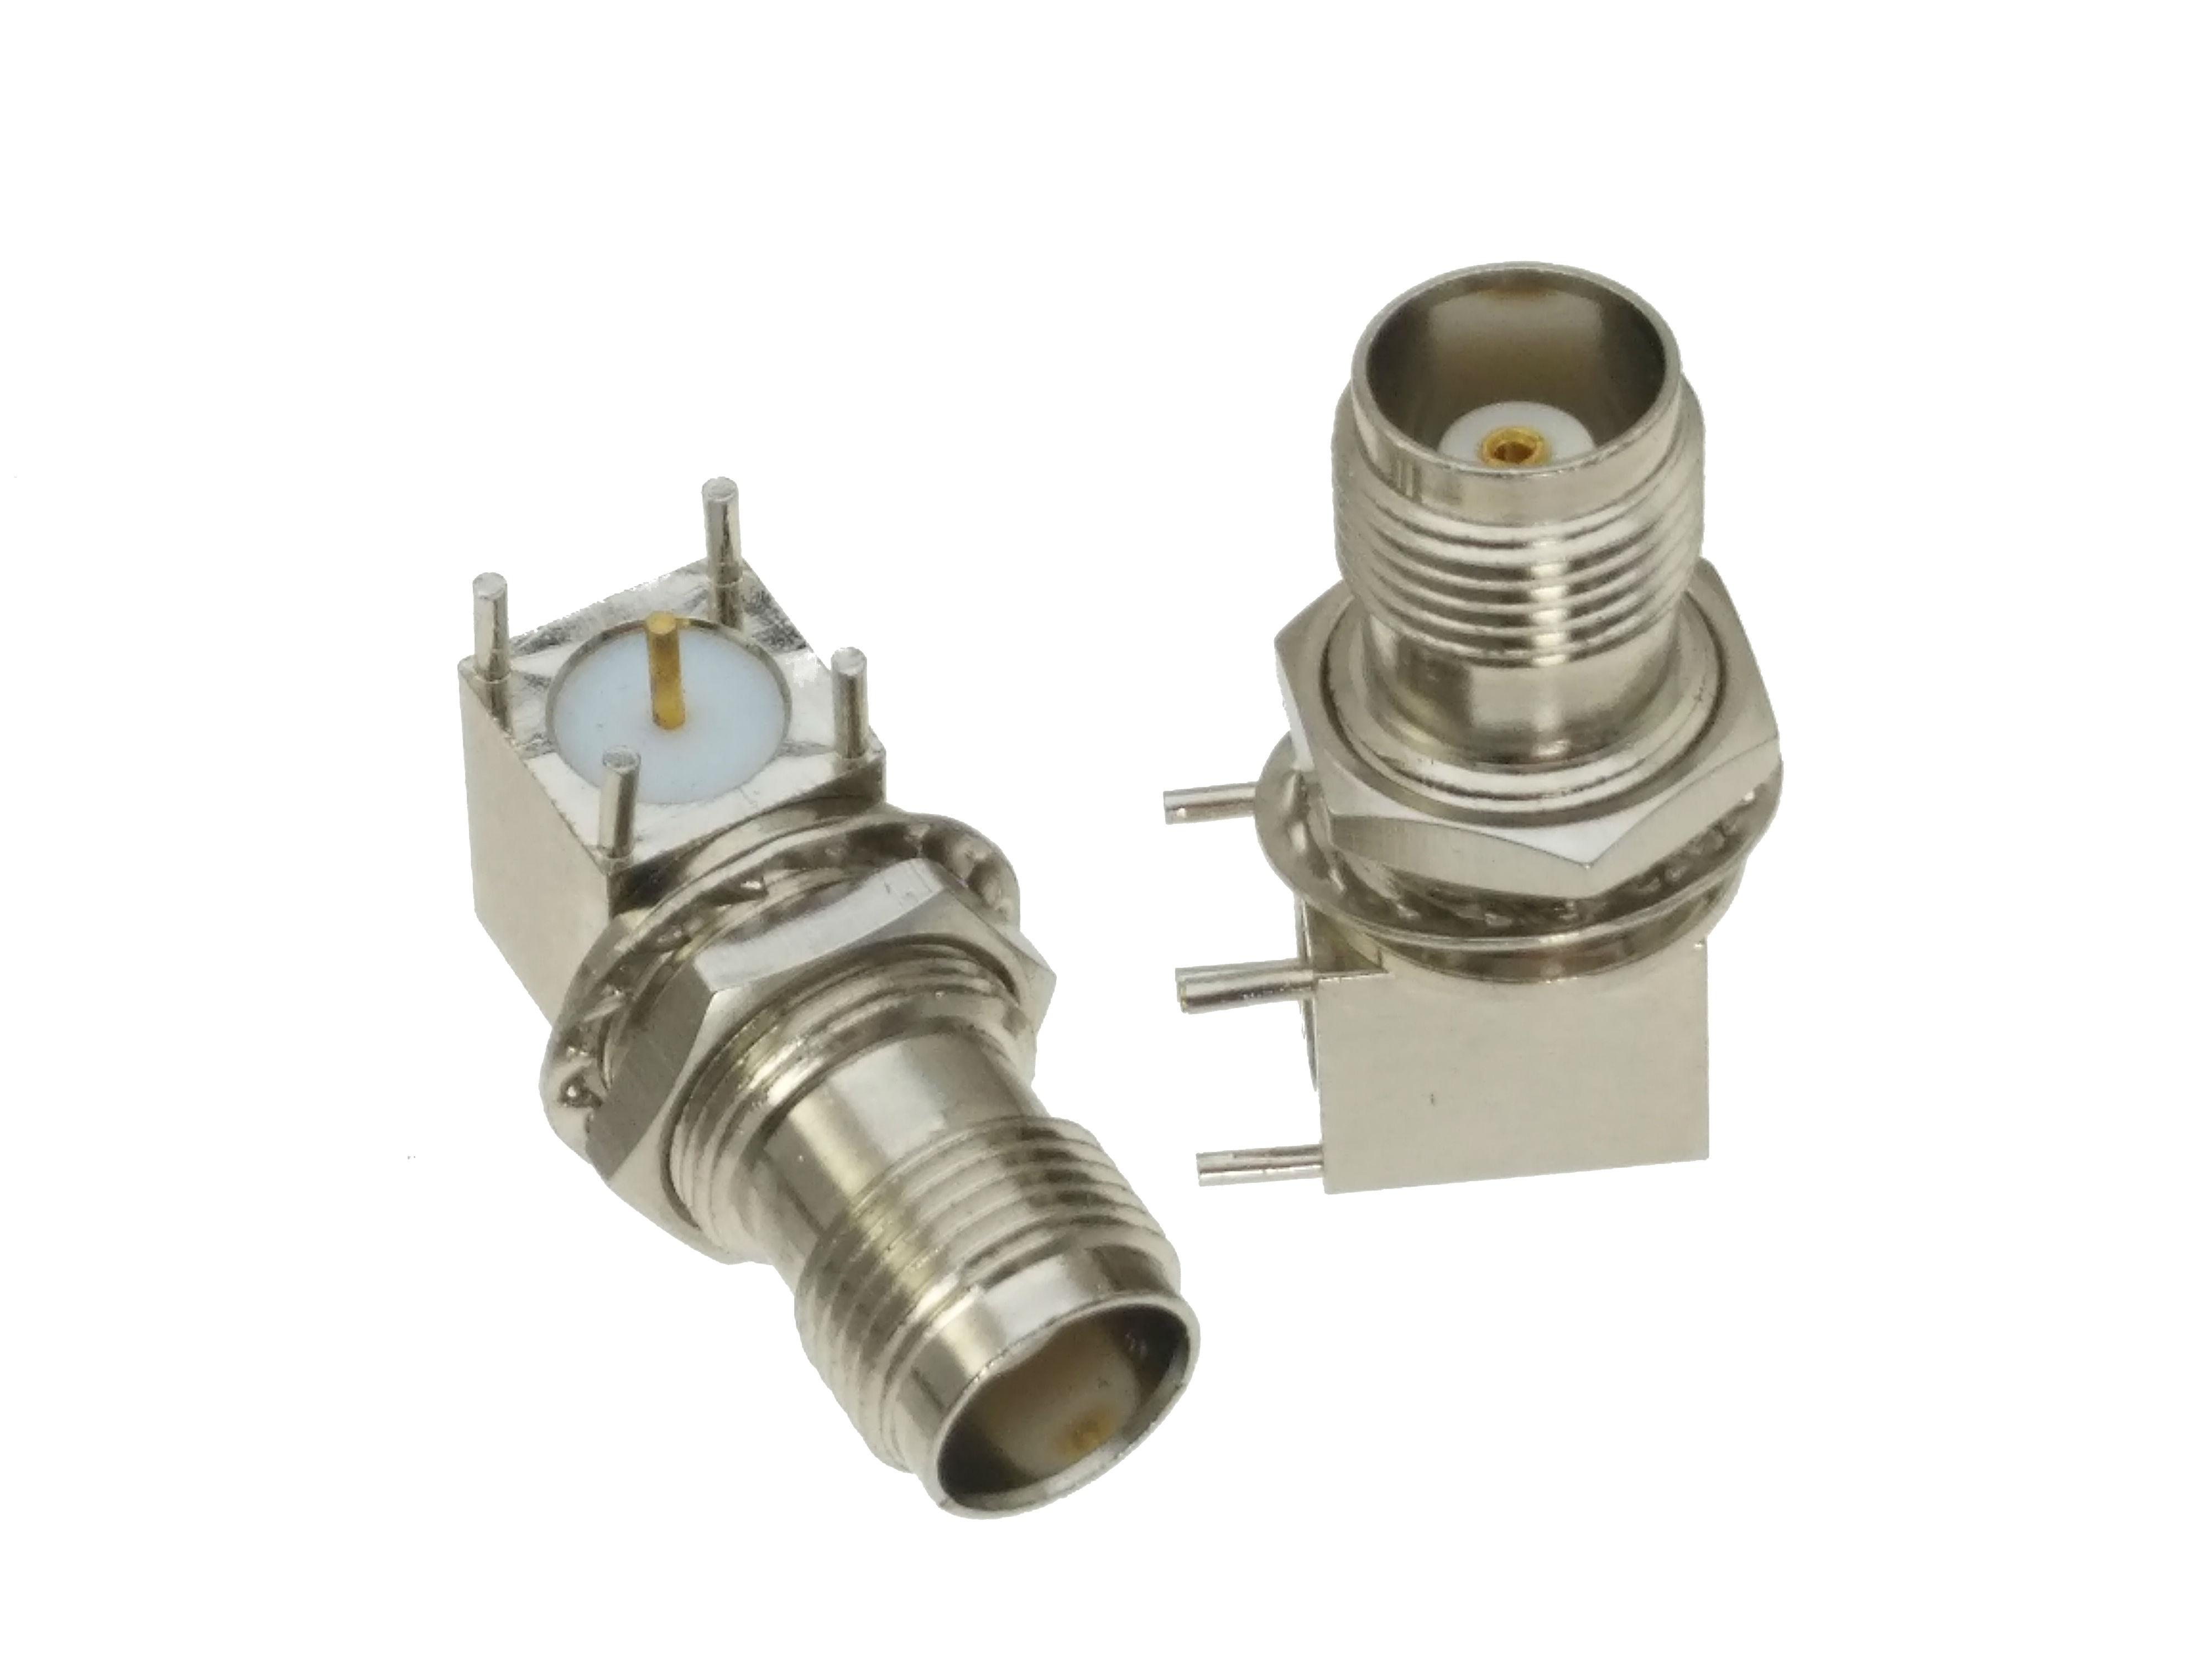 1pce F TV Female Jack Bulkhead Handle Solder panel mount RF Coax Connector